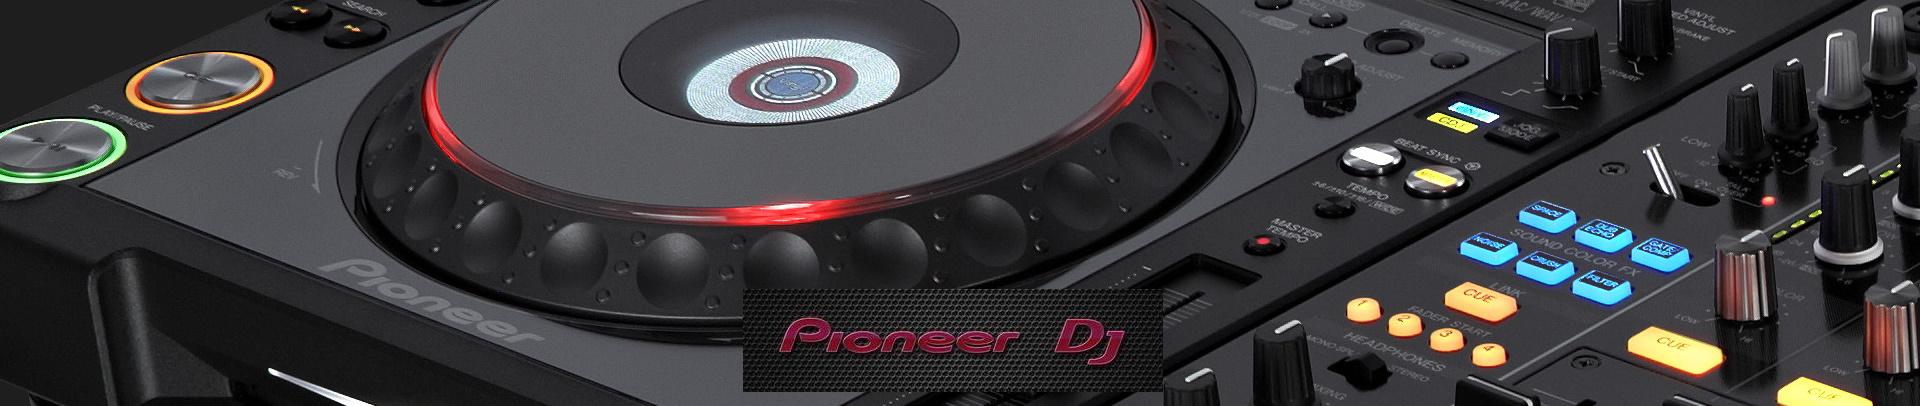 Pioneer DJ Main Image